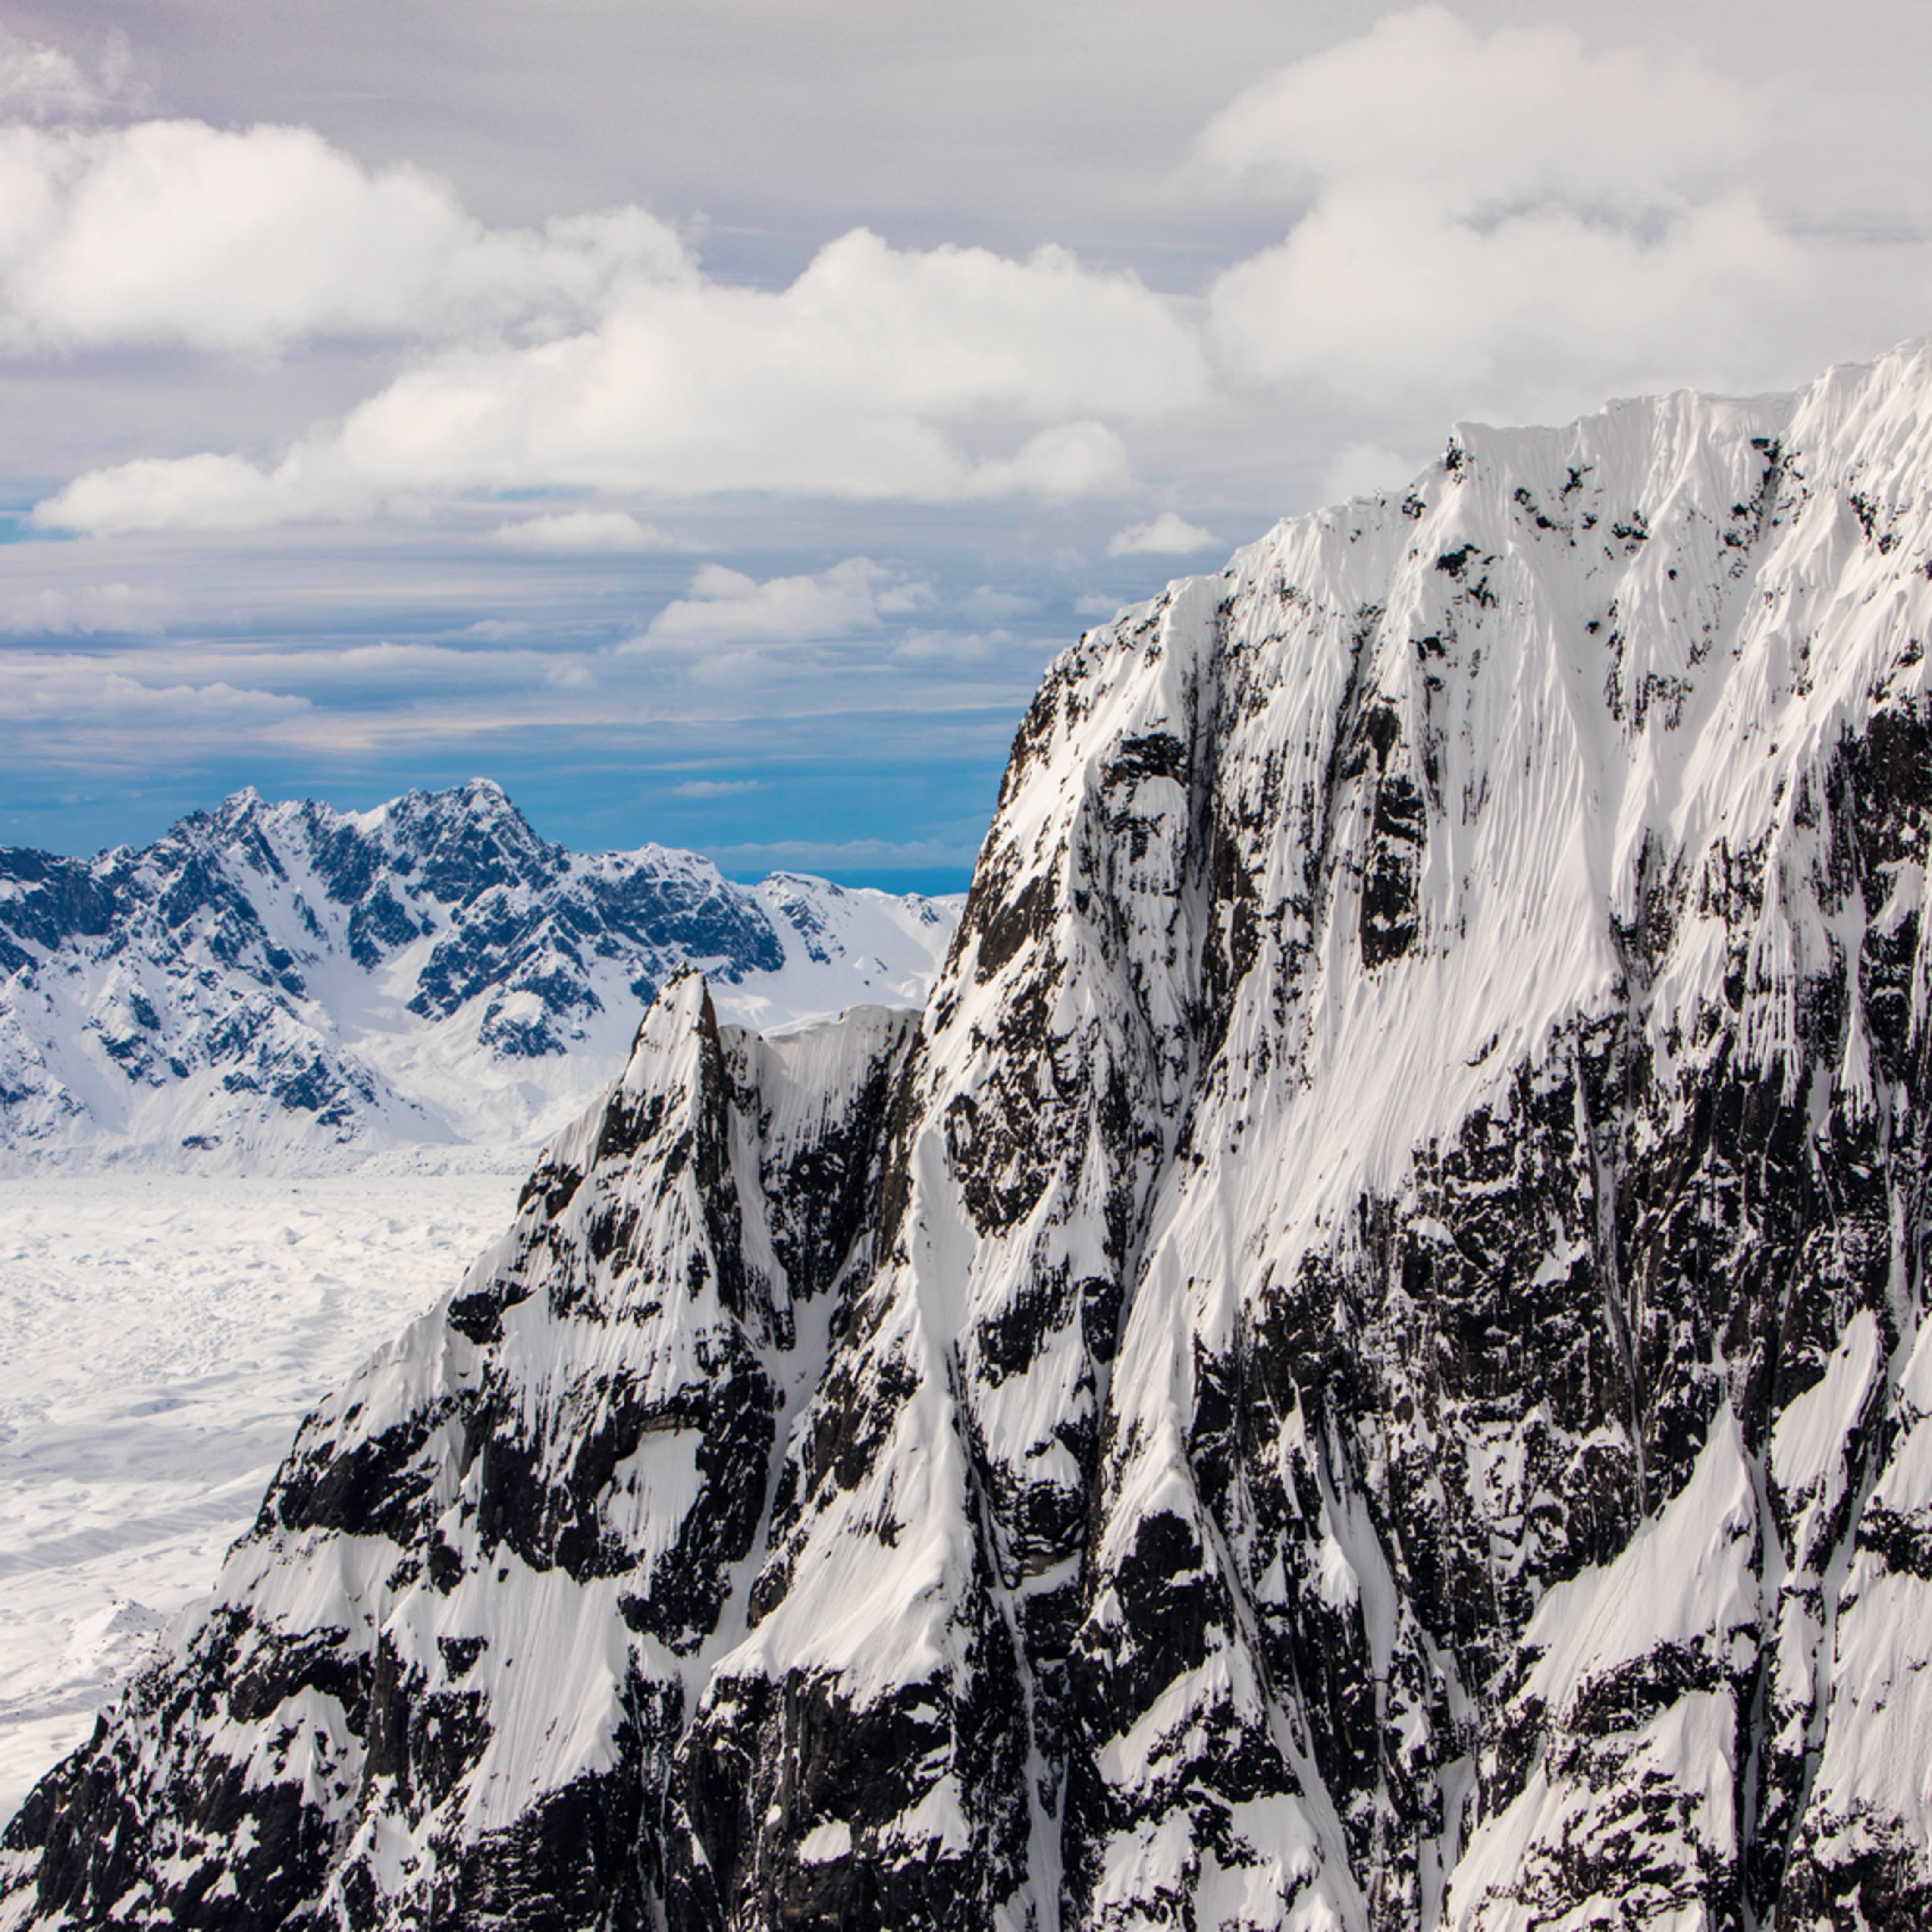 Alaskarangeglacier jmohar svbv51